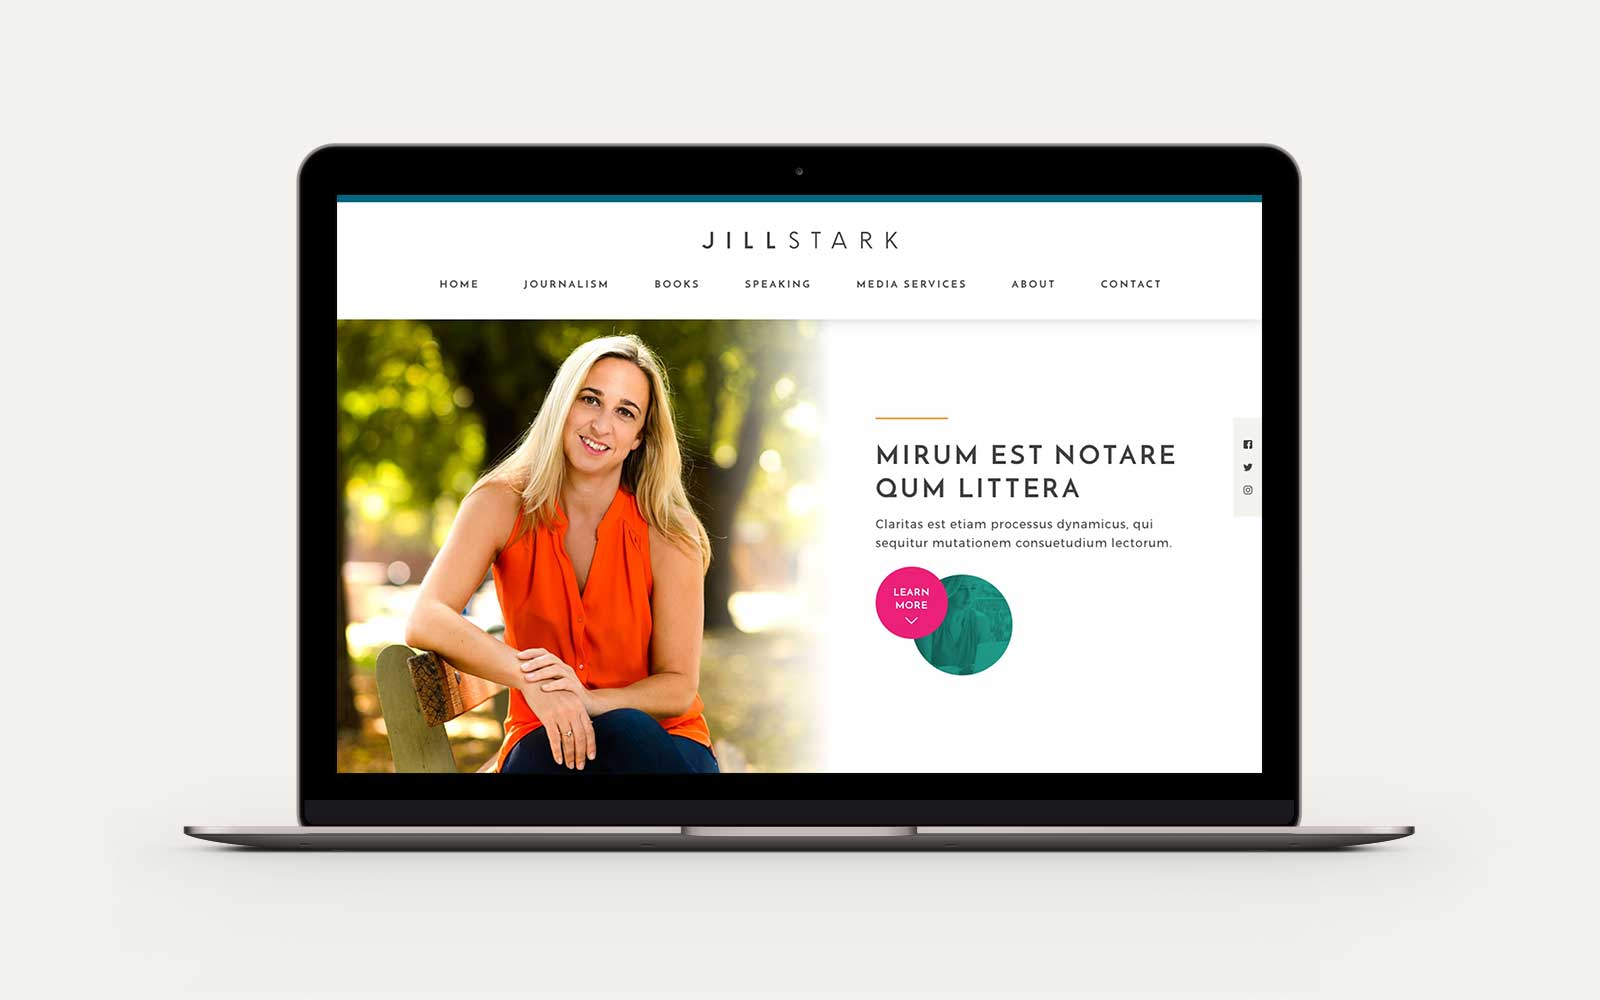 Jill Stark homepage desktop design on Macbook